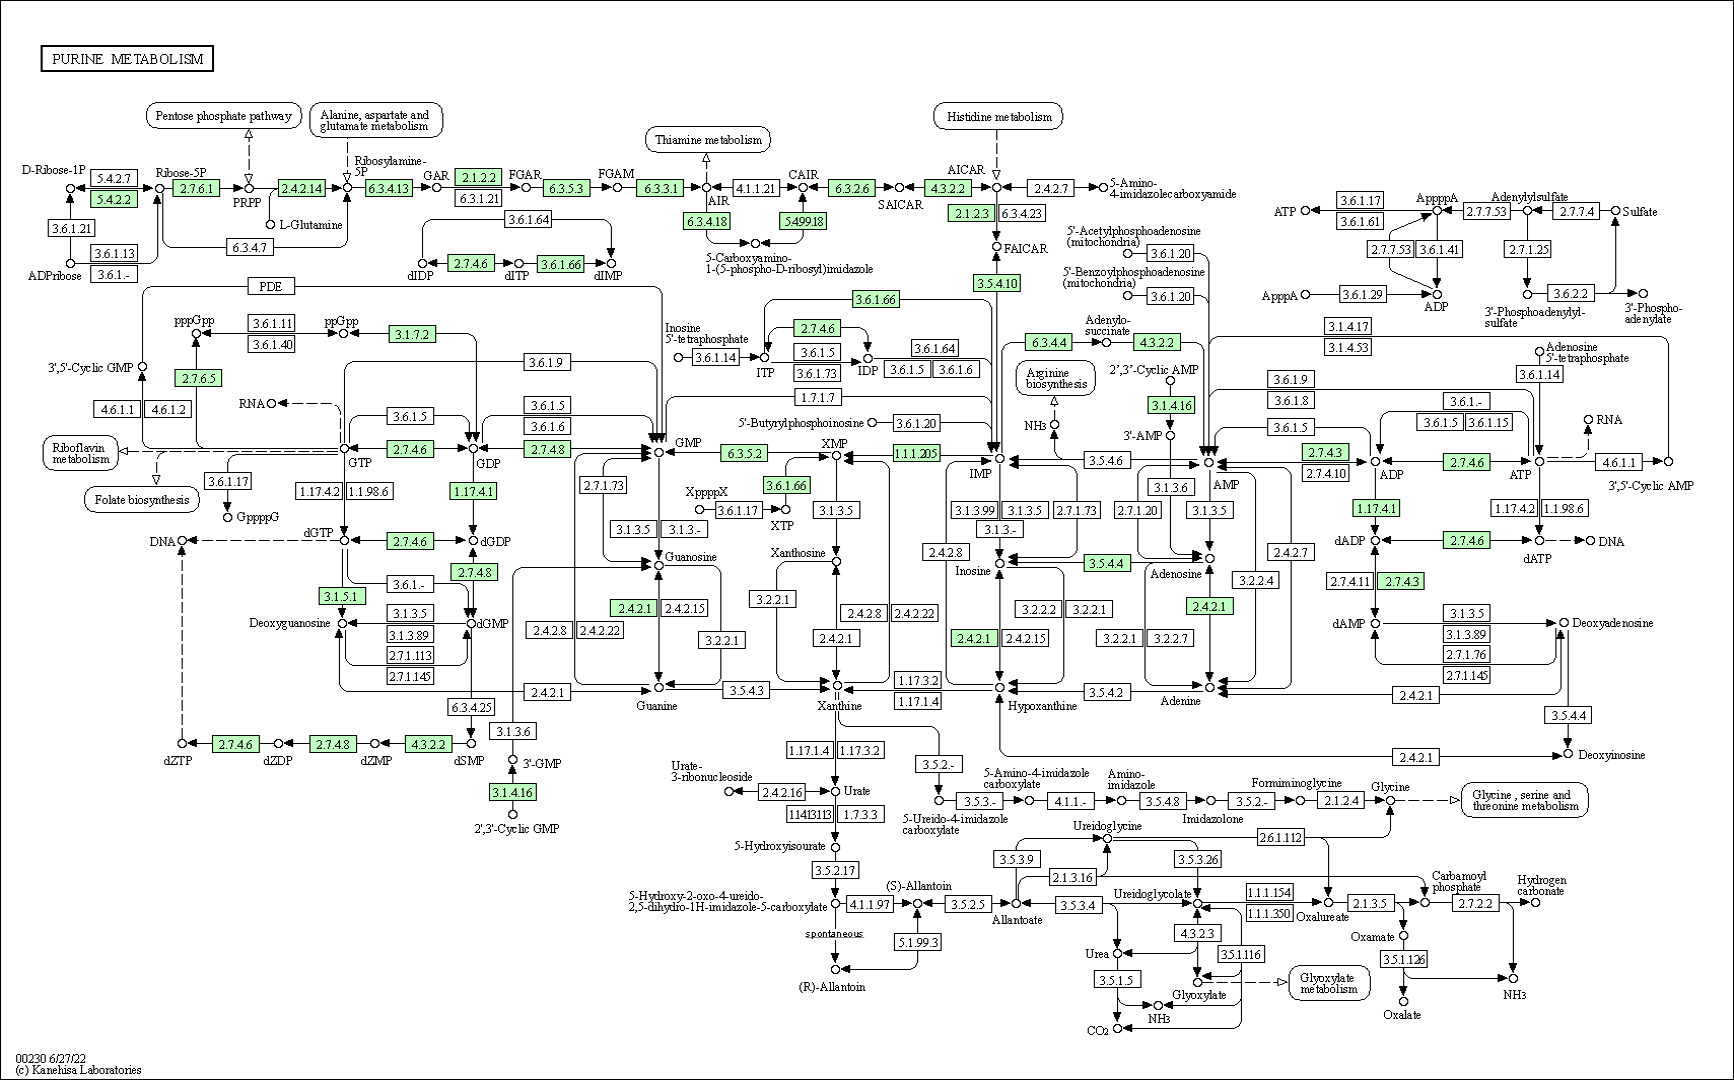 KEGG PATHWAY: Purine metabolism - Bartonella bacilliformis